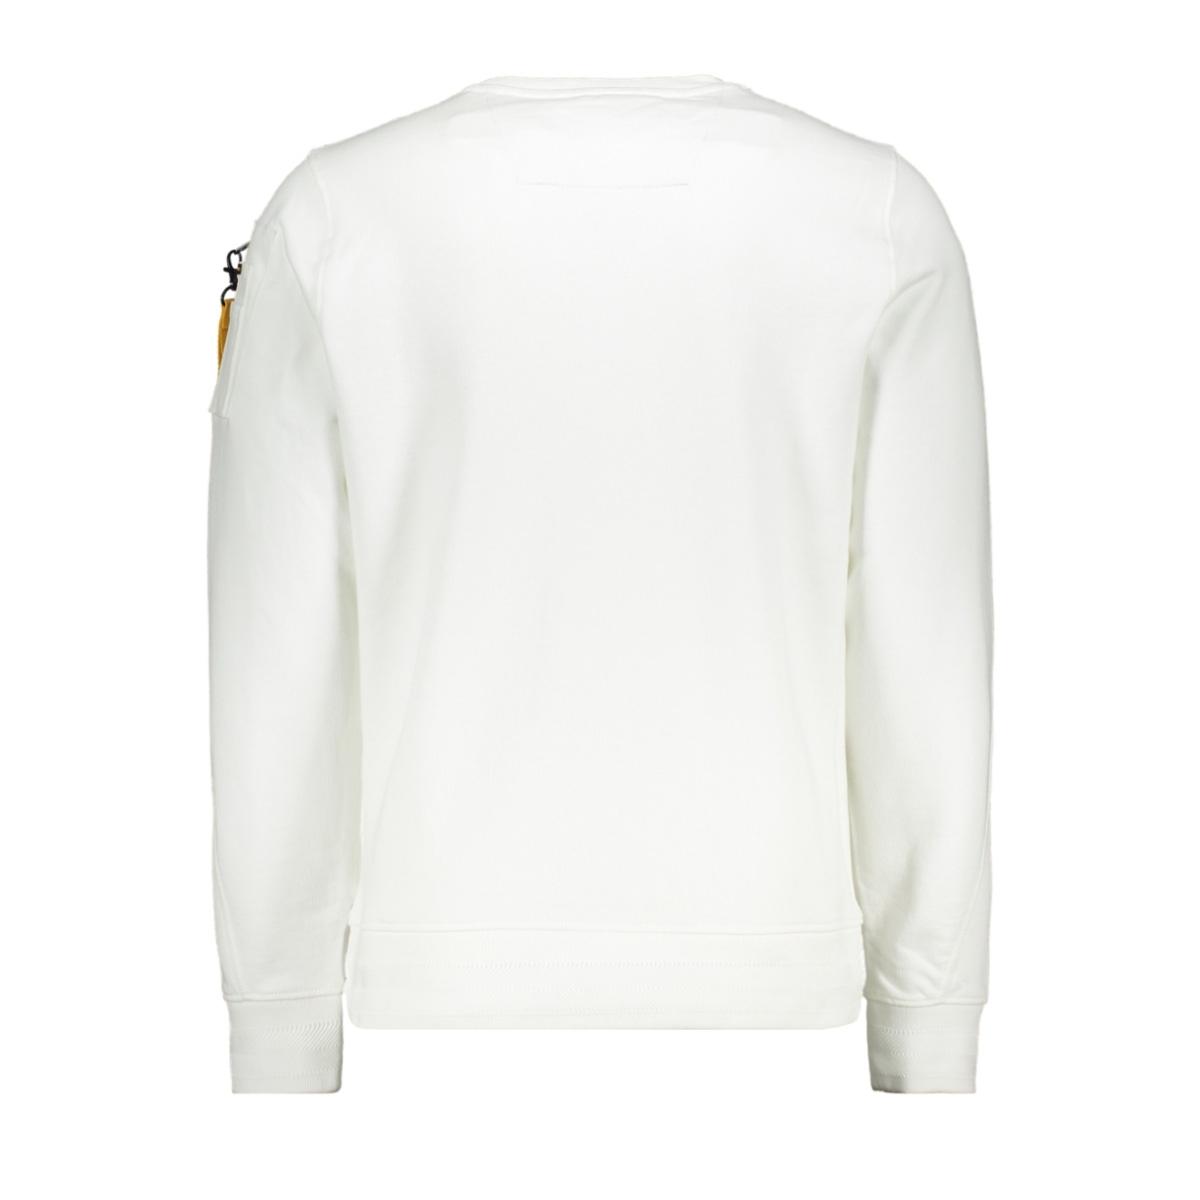 crewneck sweat psw202410 pme legend sweater 7003